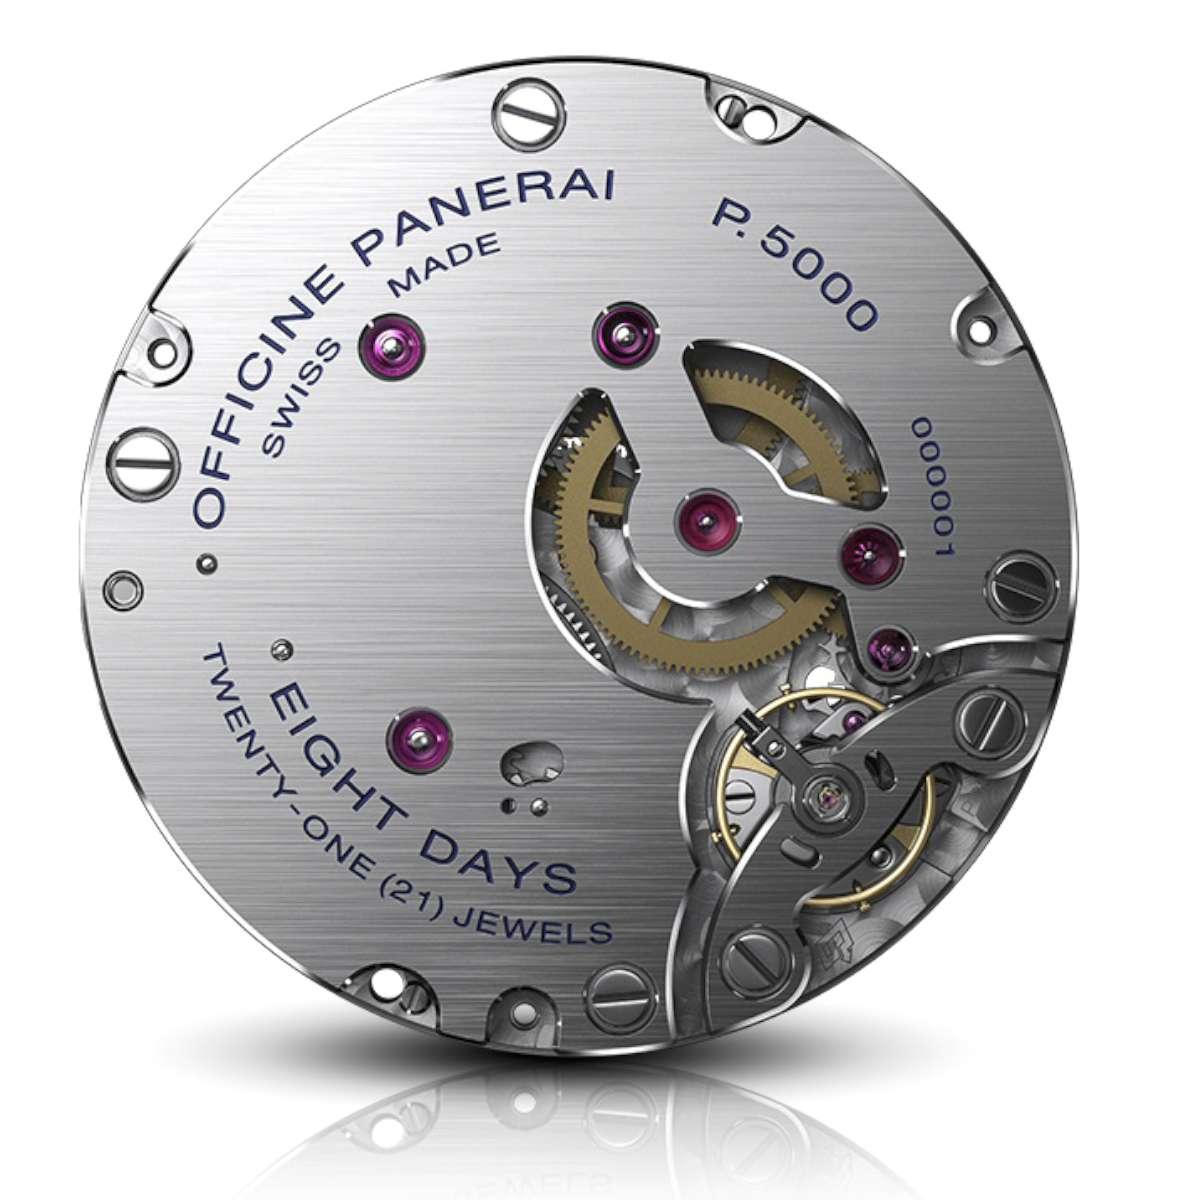 Panerai P.5000 movement